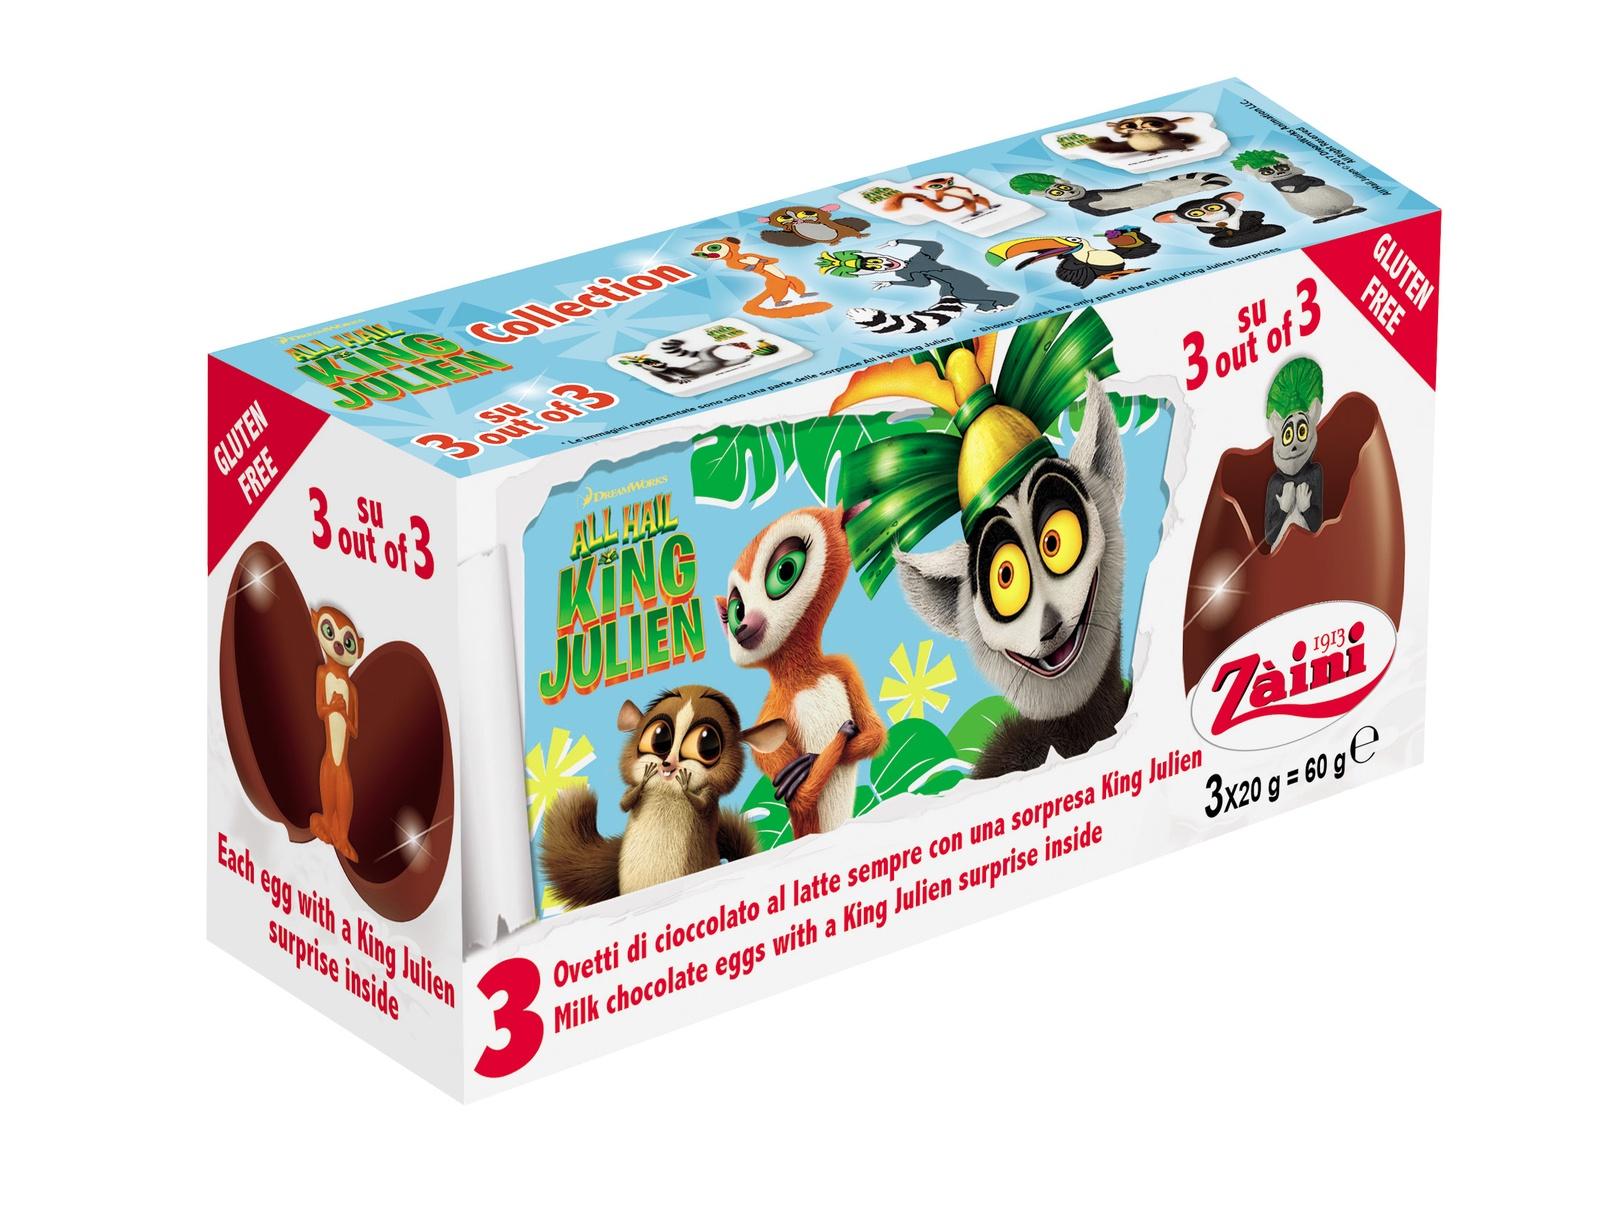 Шоколадное яйцо ZAINI Шоколадное яйцо KING JULIEN с коллекционной игрушкой-сюрпризом внутри Zaini (JUIEN) tpk, Молочно-шоколадный zaini choco